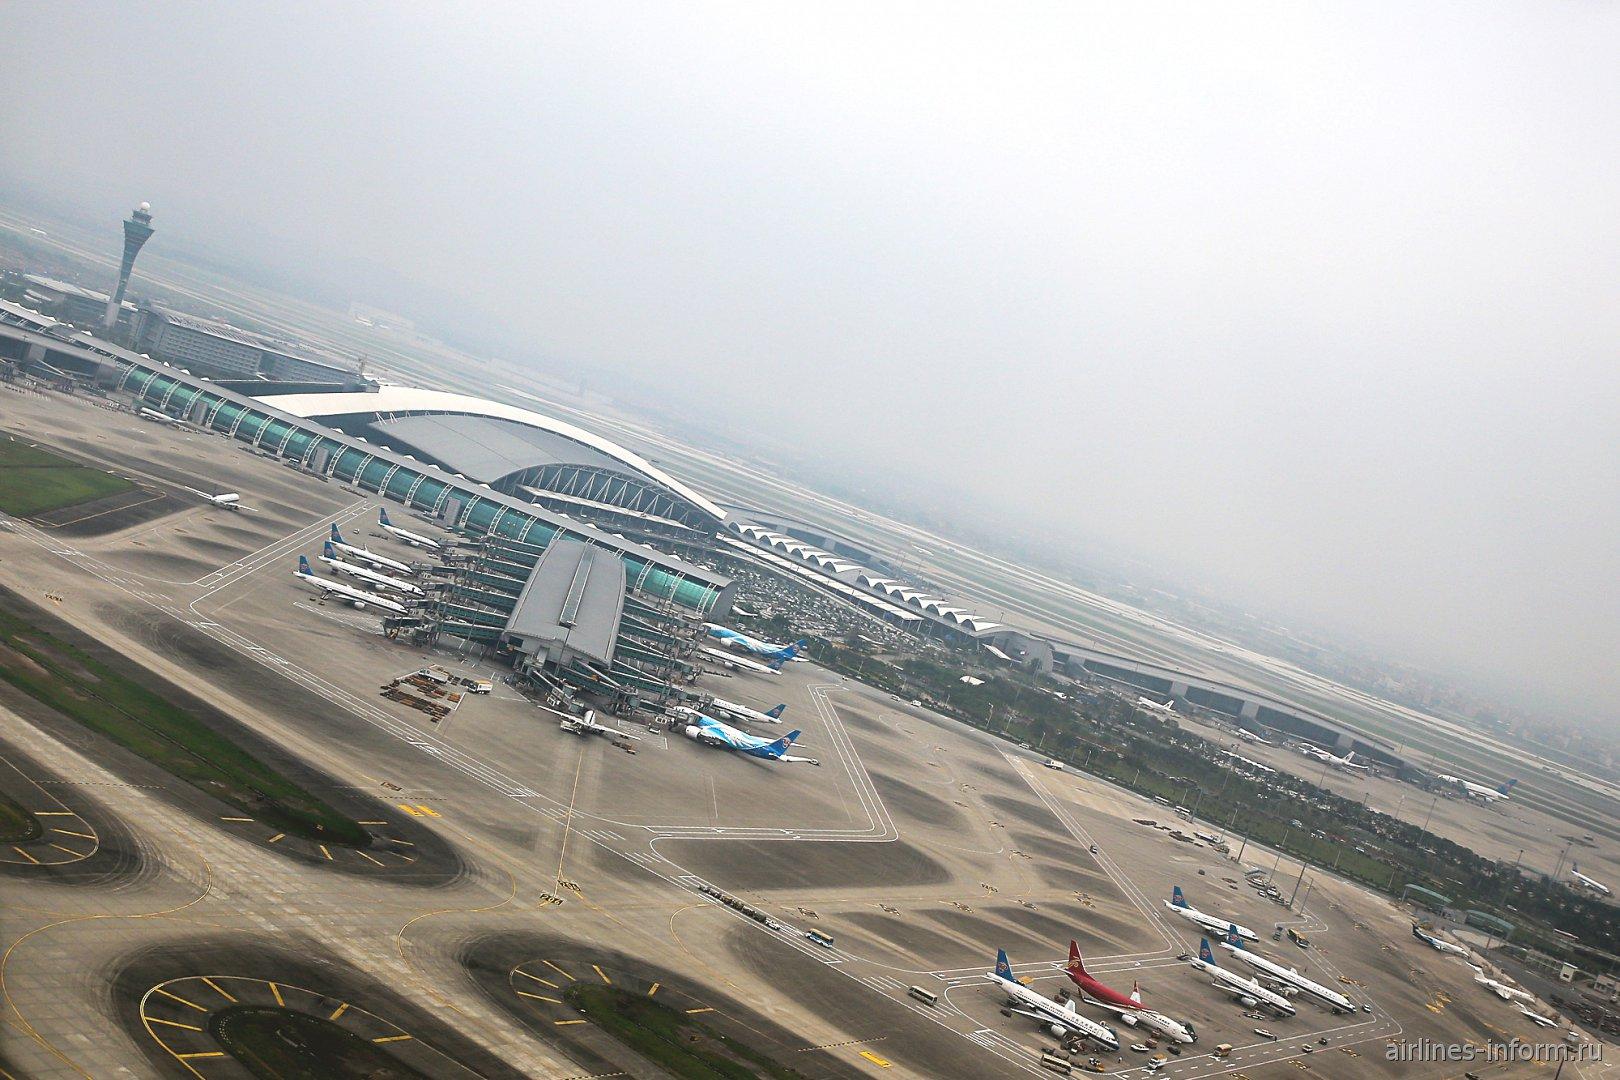 Вид при взлете на аэропорт Гуанчжоу Байюнь